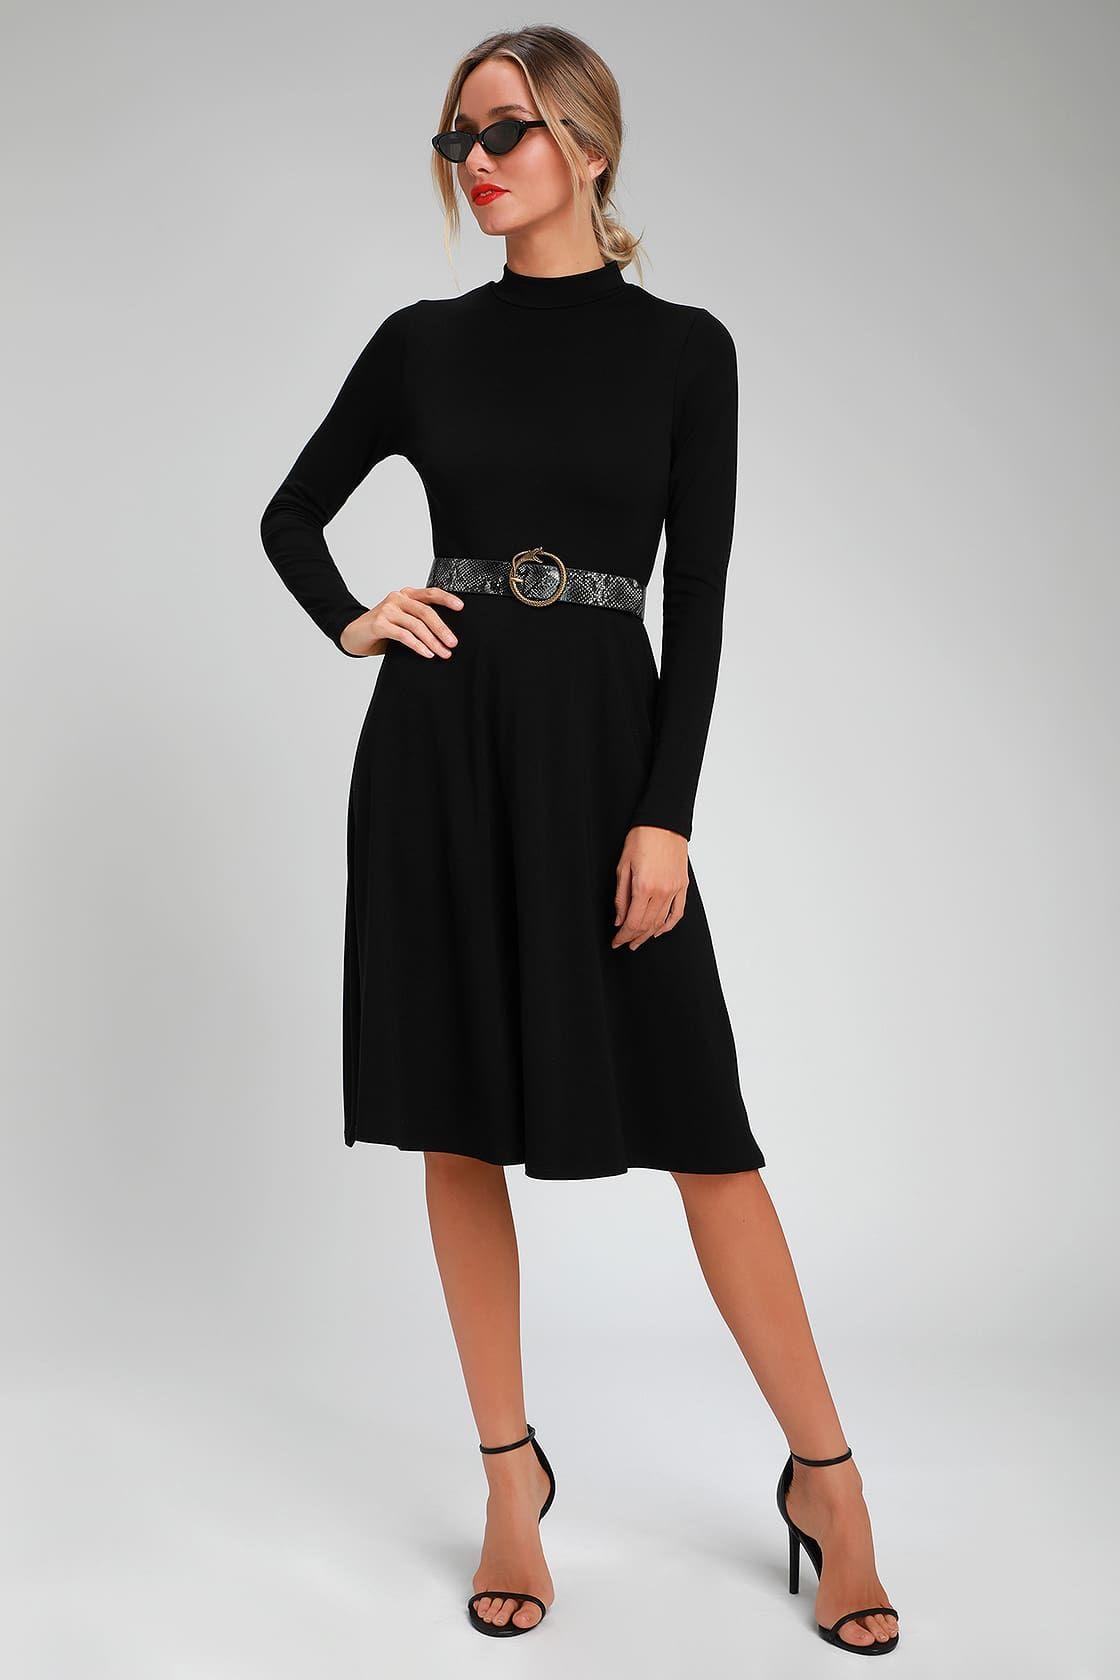 Maliyah Black Long Sleeve Midi Skater Dress Black Long Sleeve Dress Long Sleeve Short Dress Midi Skater Dress [ 1680 x 1120 Pixel ]